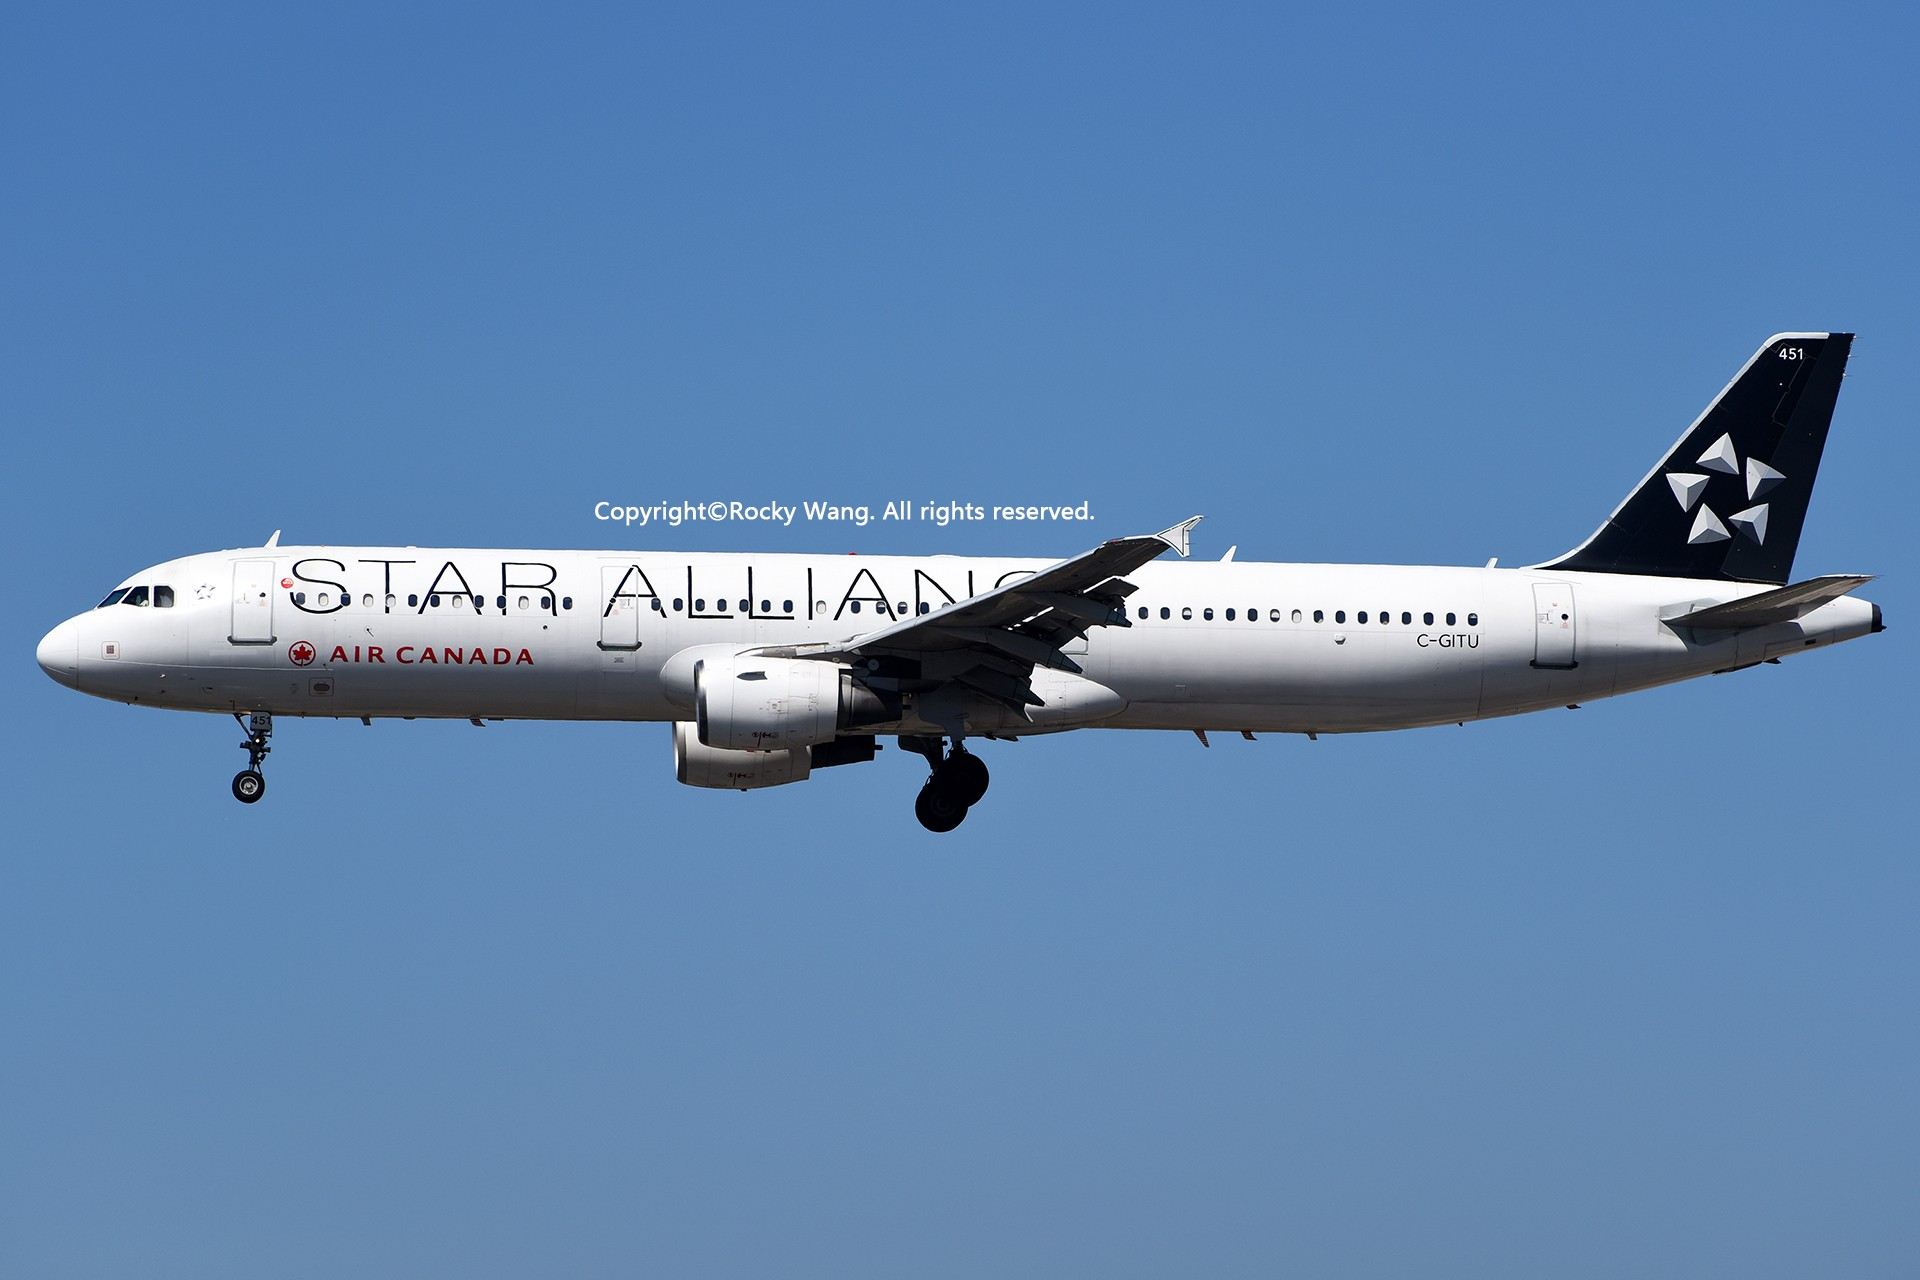 Re:[原创]彩绘圣地-附加彩蛋 AIRBUS A321-211 C-GITU Los Angeles Int'l Airport